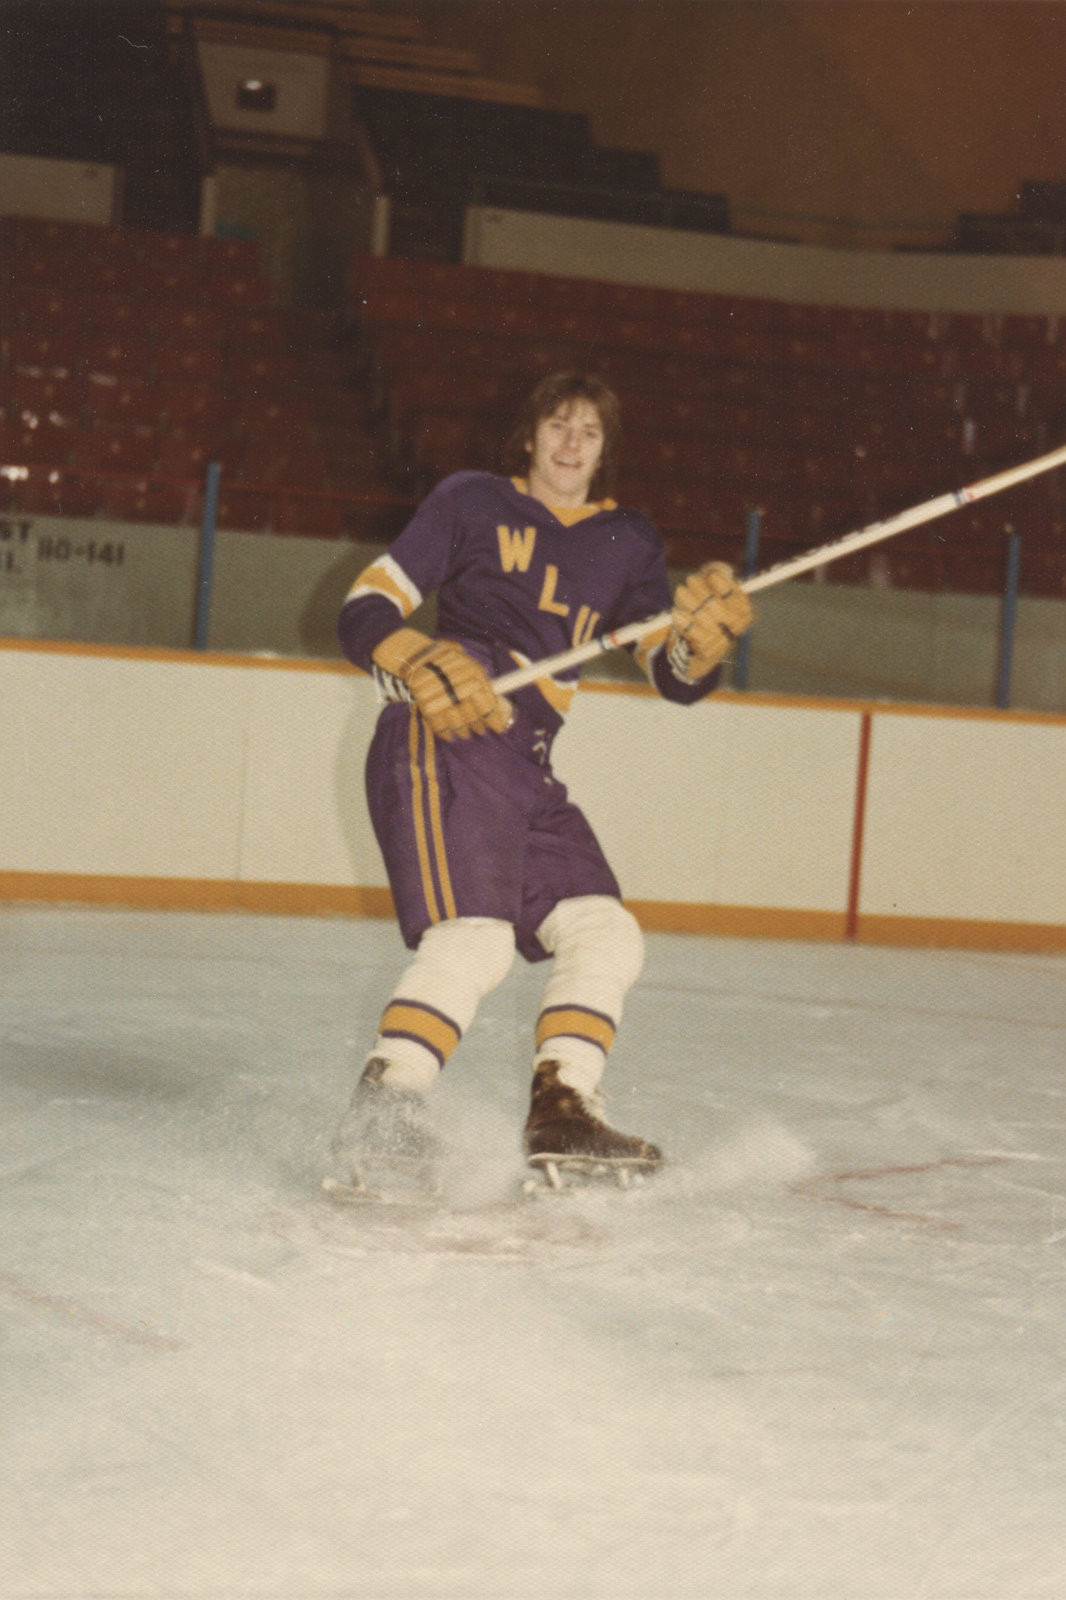 Gavin Smith, Wilfrid Laurier University hockey player